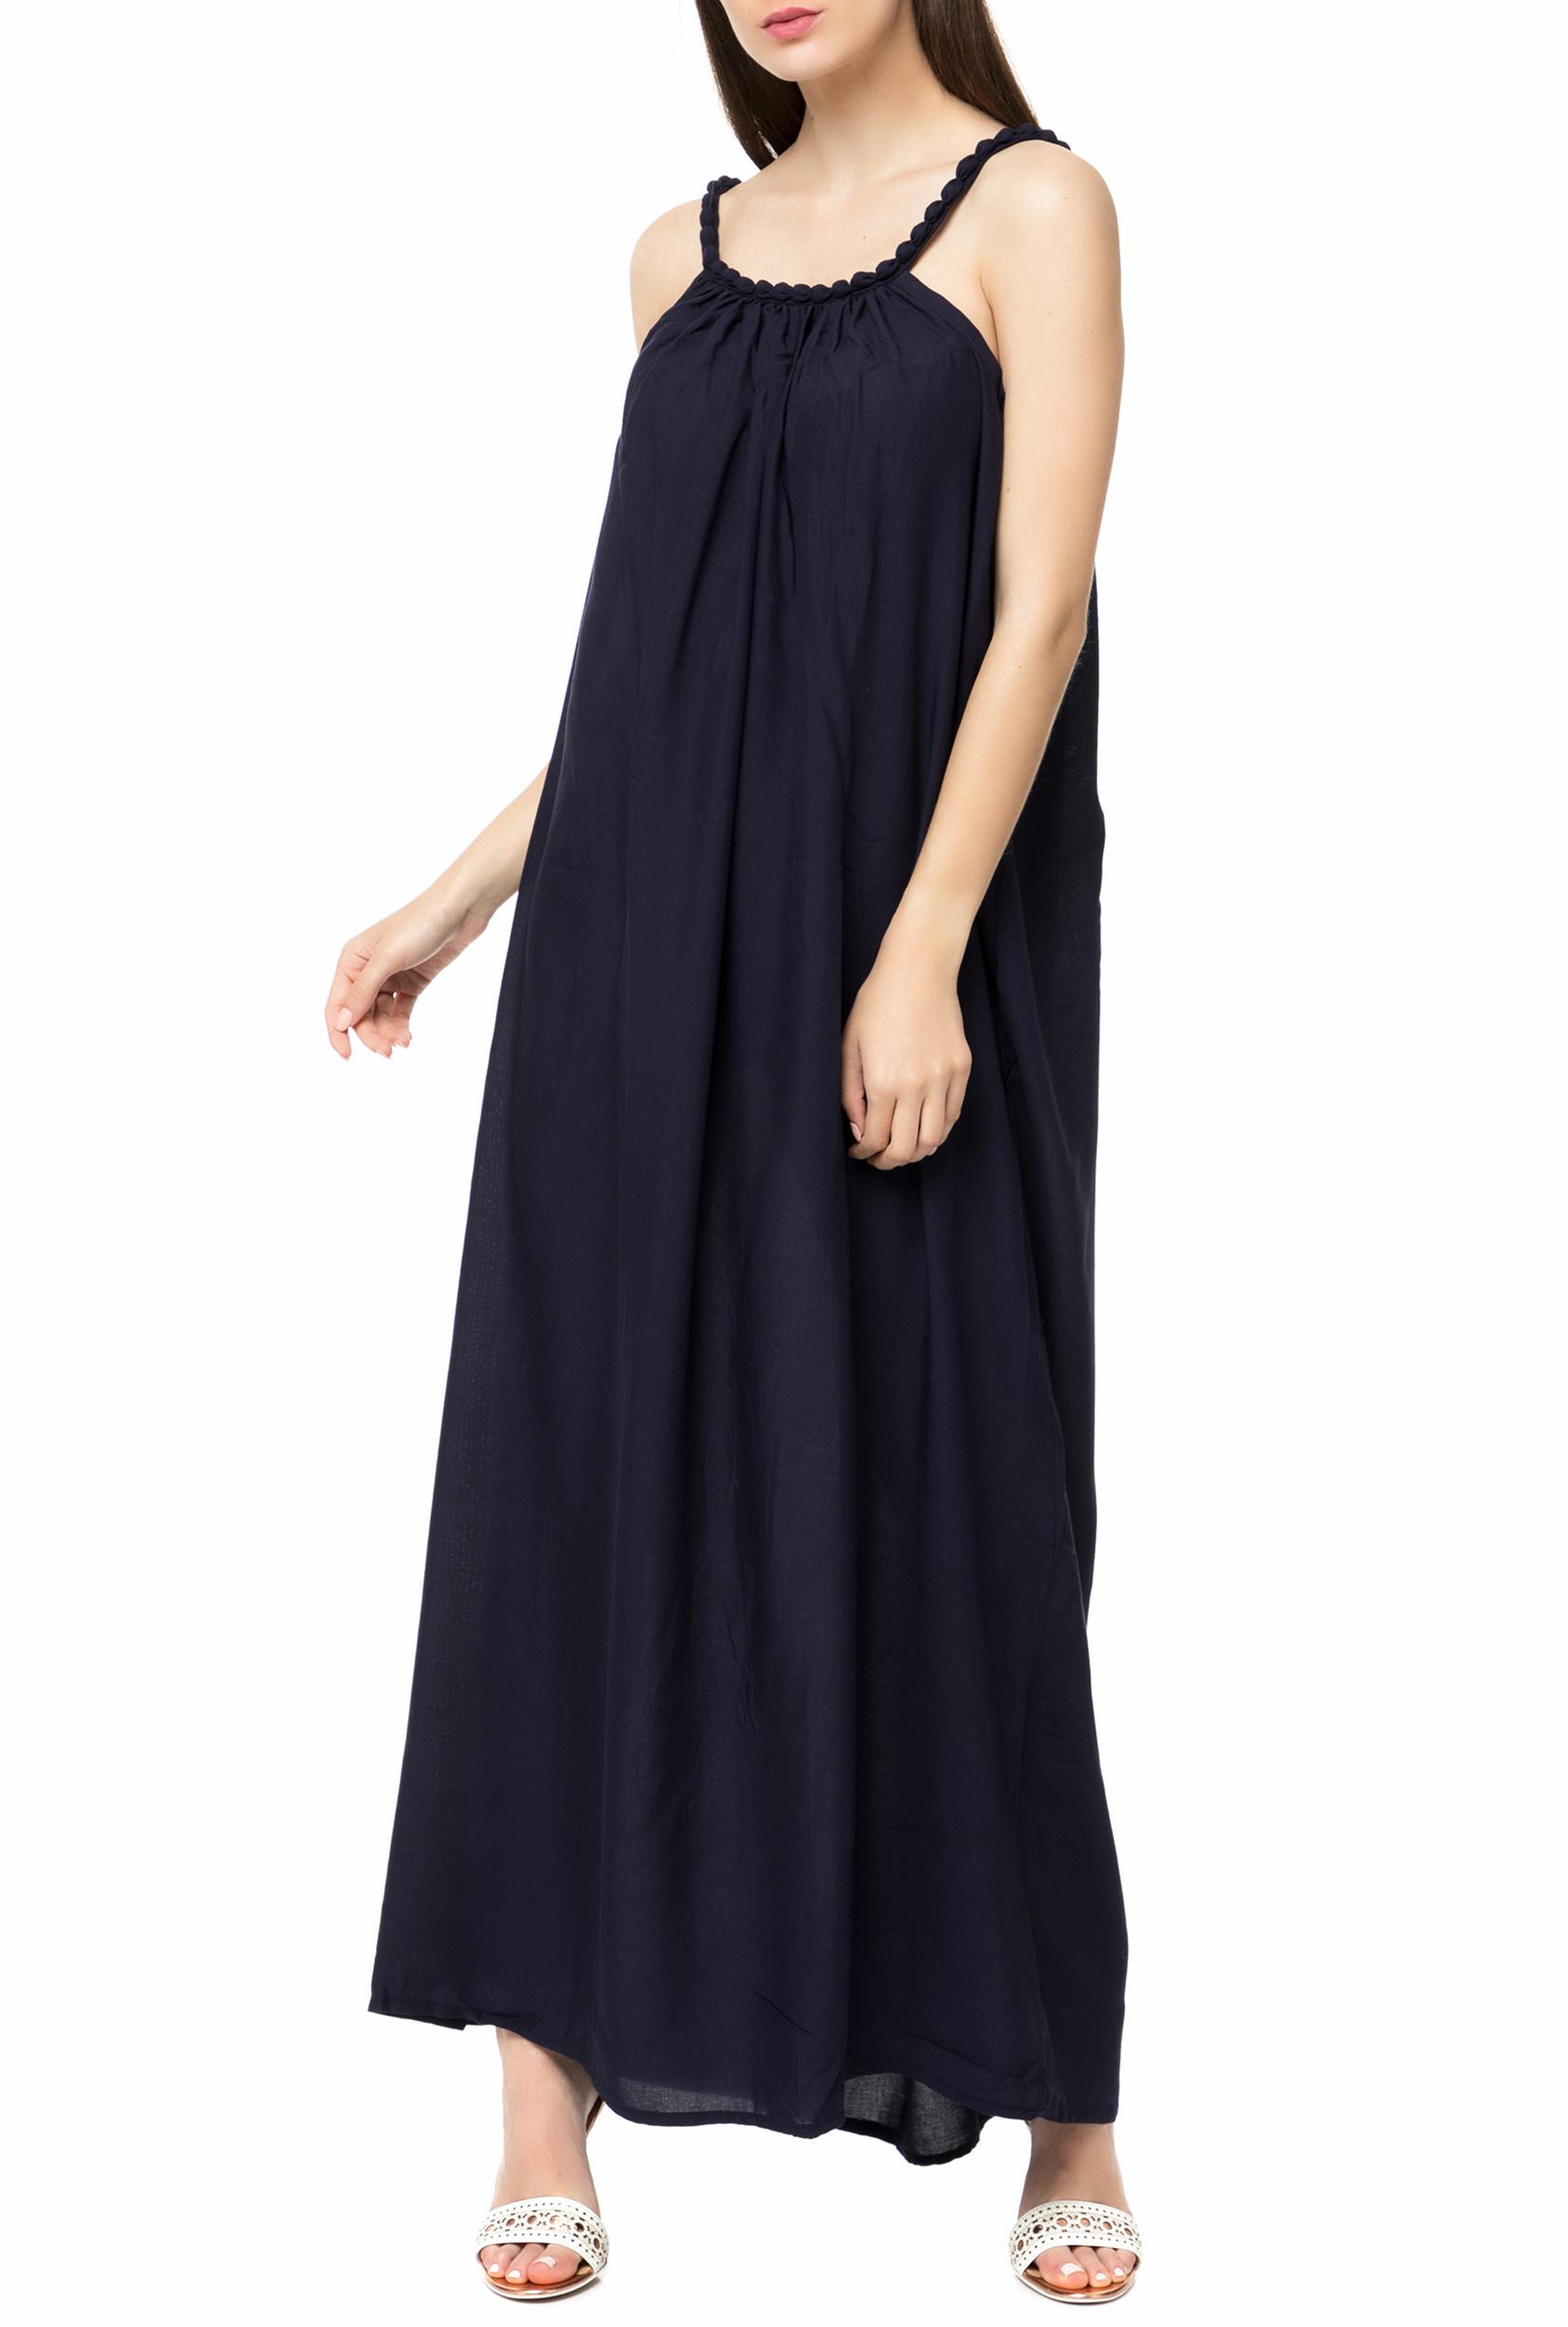 407318e6b943 MOLLY BRACKEN - Γυναικείο μάξι φόρεμα MOLLY BRACKEN μπλε